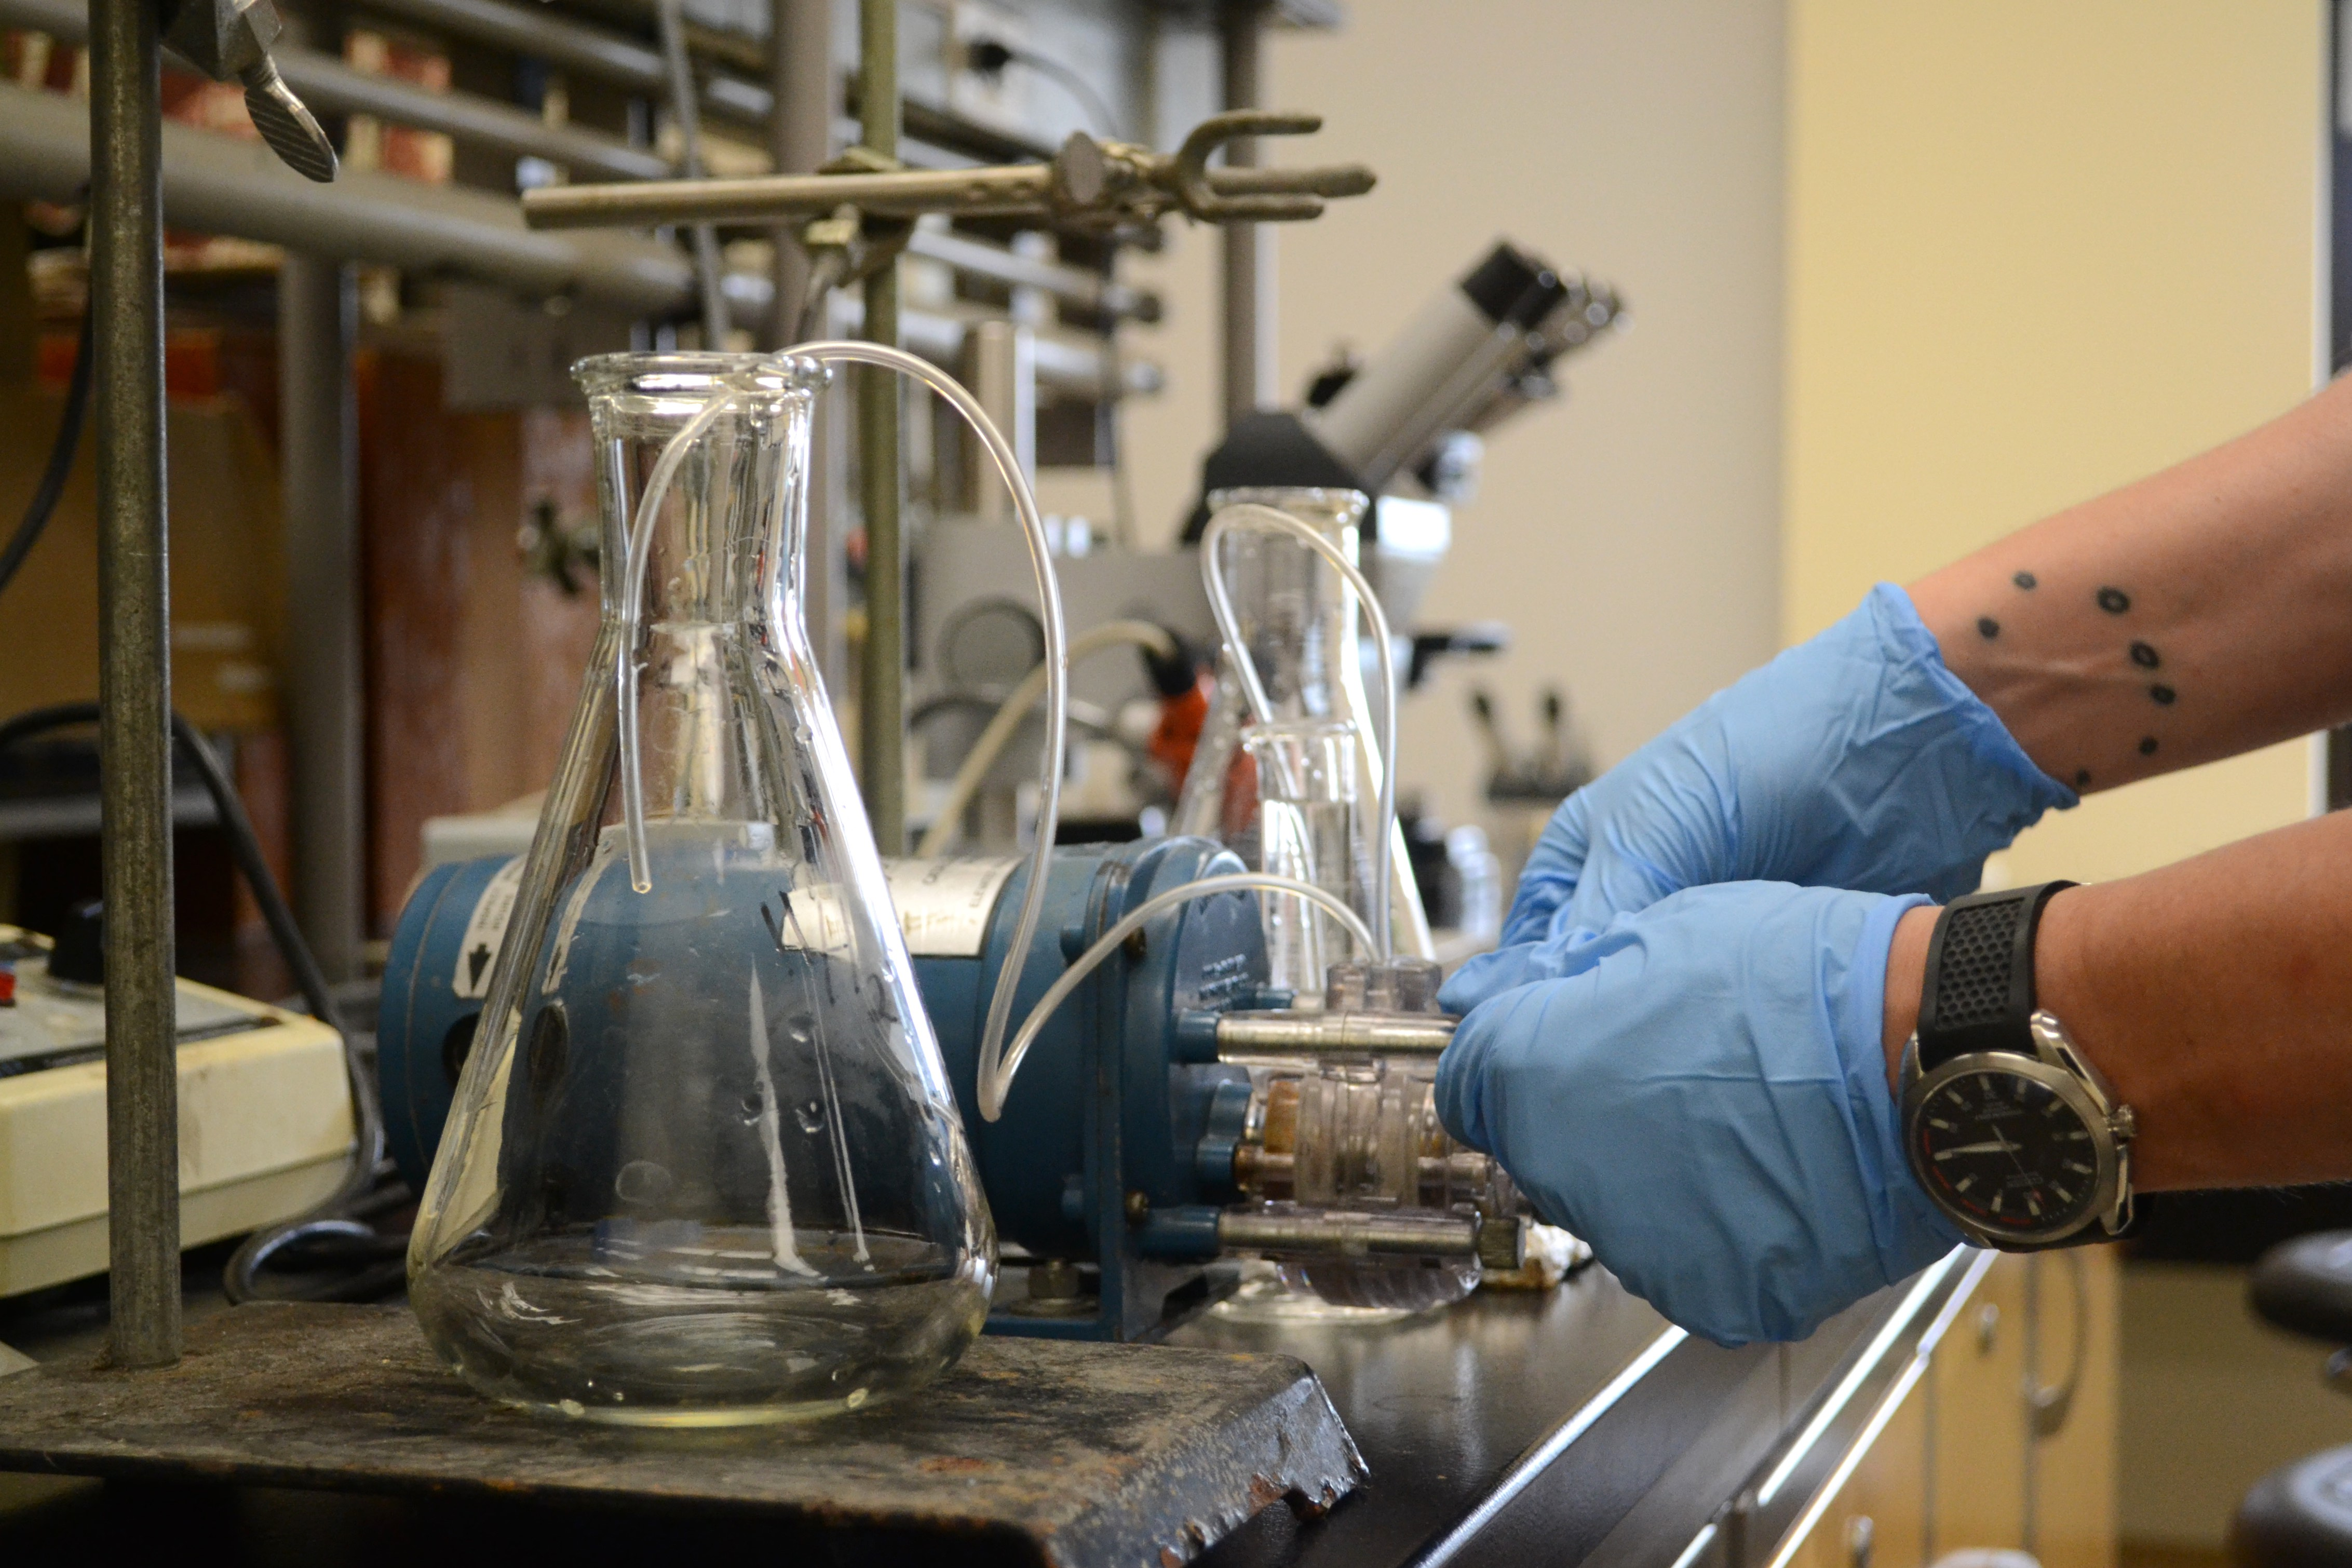 NATURE Lab workshop -- Hormone Hacking: Harvesting Endocrine Disruptors  with bioartist Byron Rich